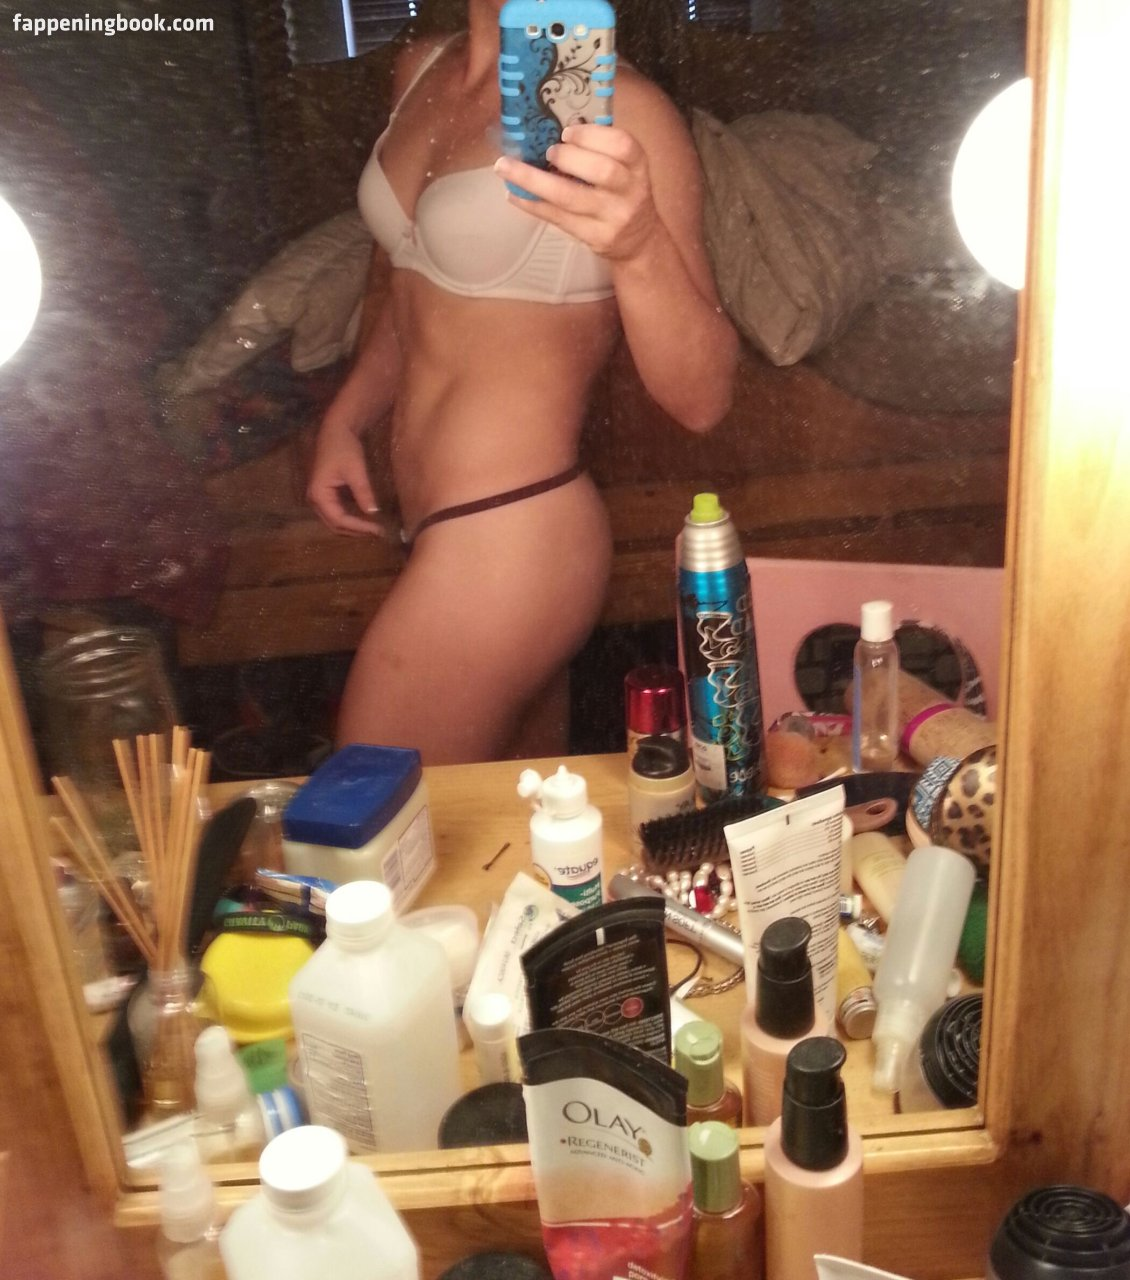 Angela Magana Uncensored angela magana nude, sexy, the fappening, uncensored - photo